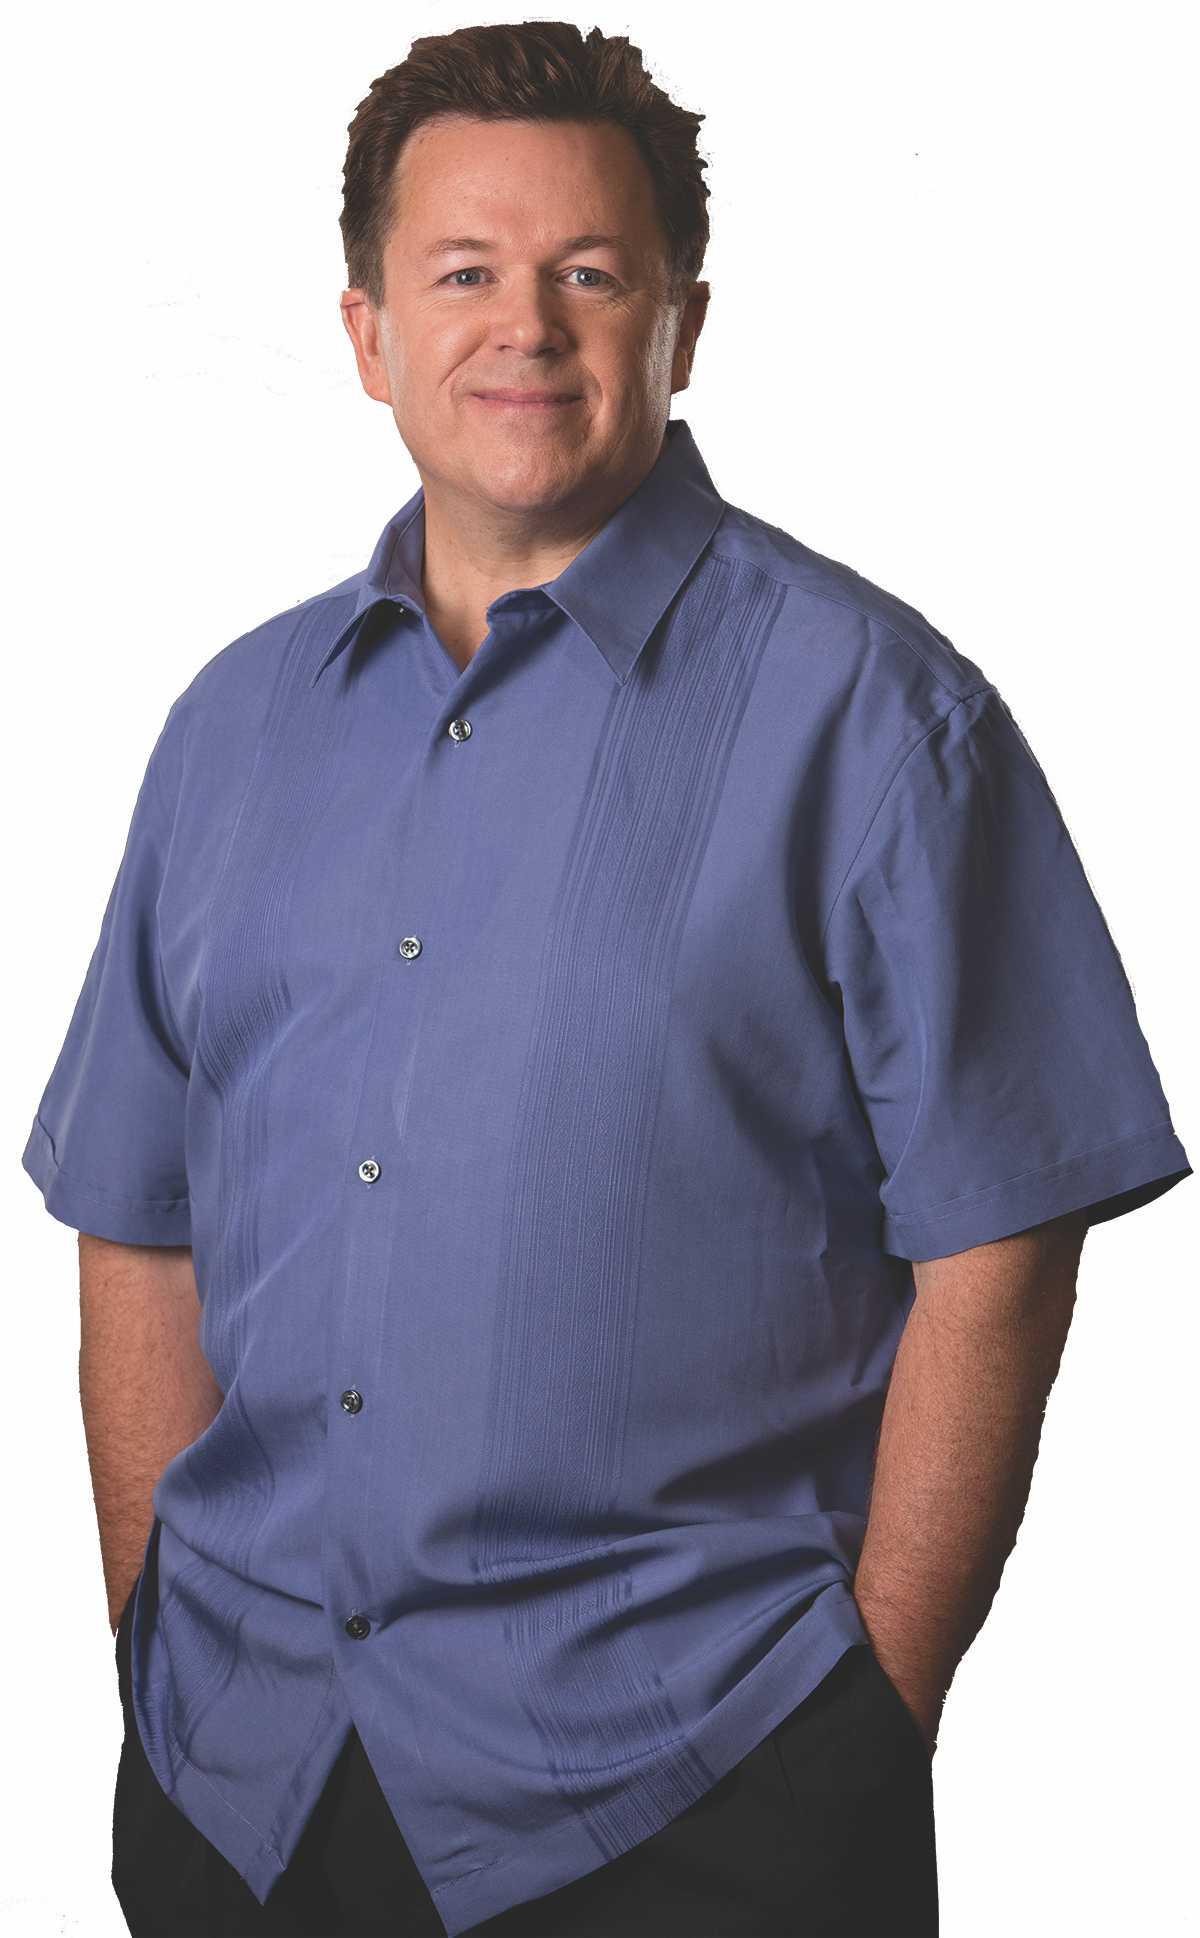 David Kauffman